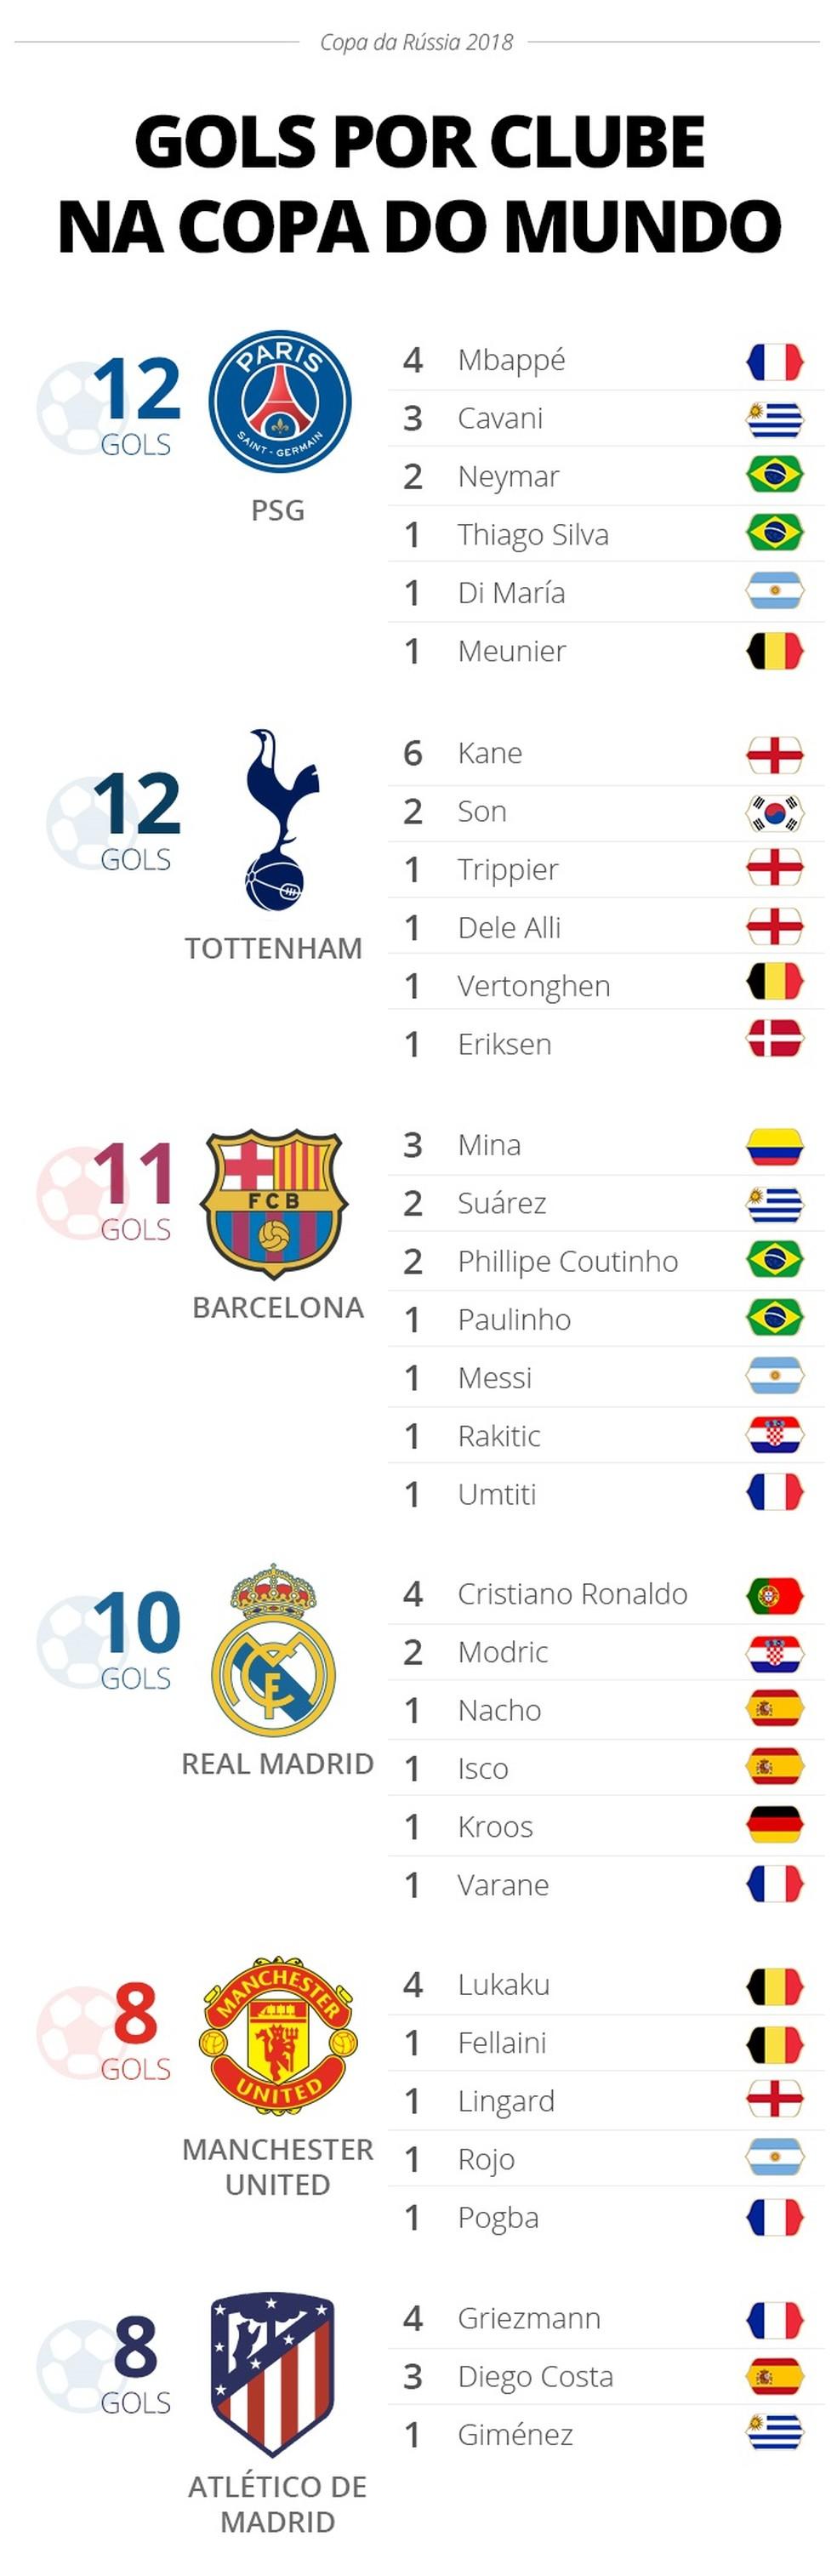 Info - ranking final de gols por clube na Copa 2018 (Foto: GloboEsporte.com)